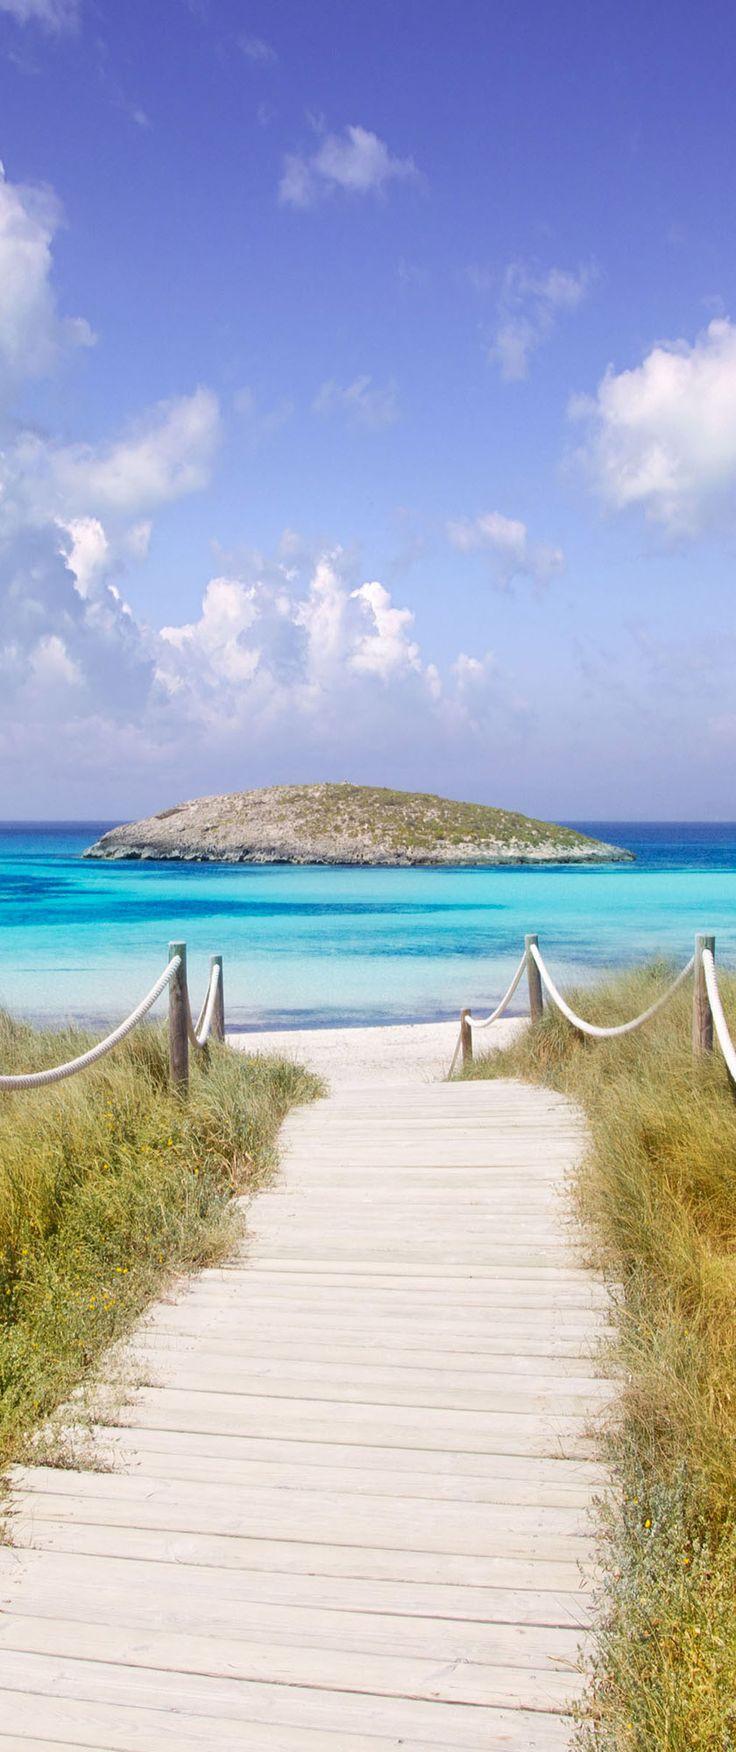 Eiland clipart beach scene Beach Beaches: on Spain island